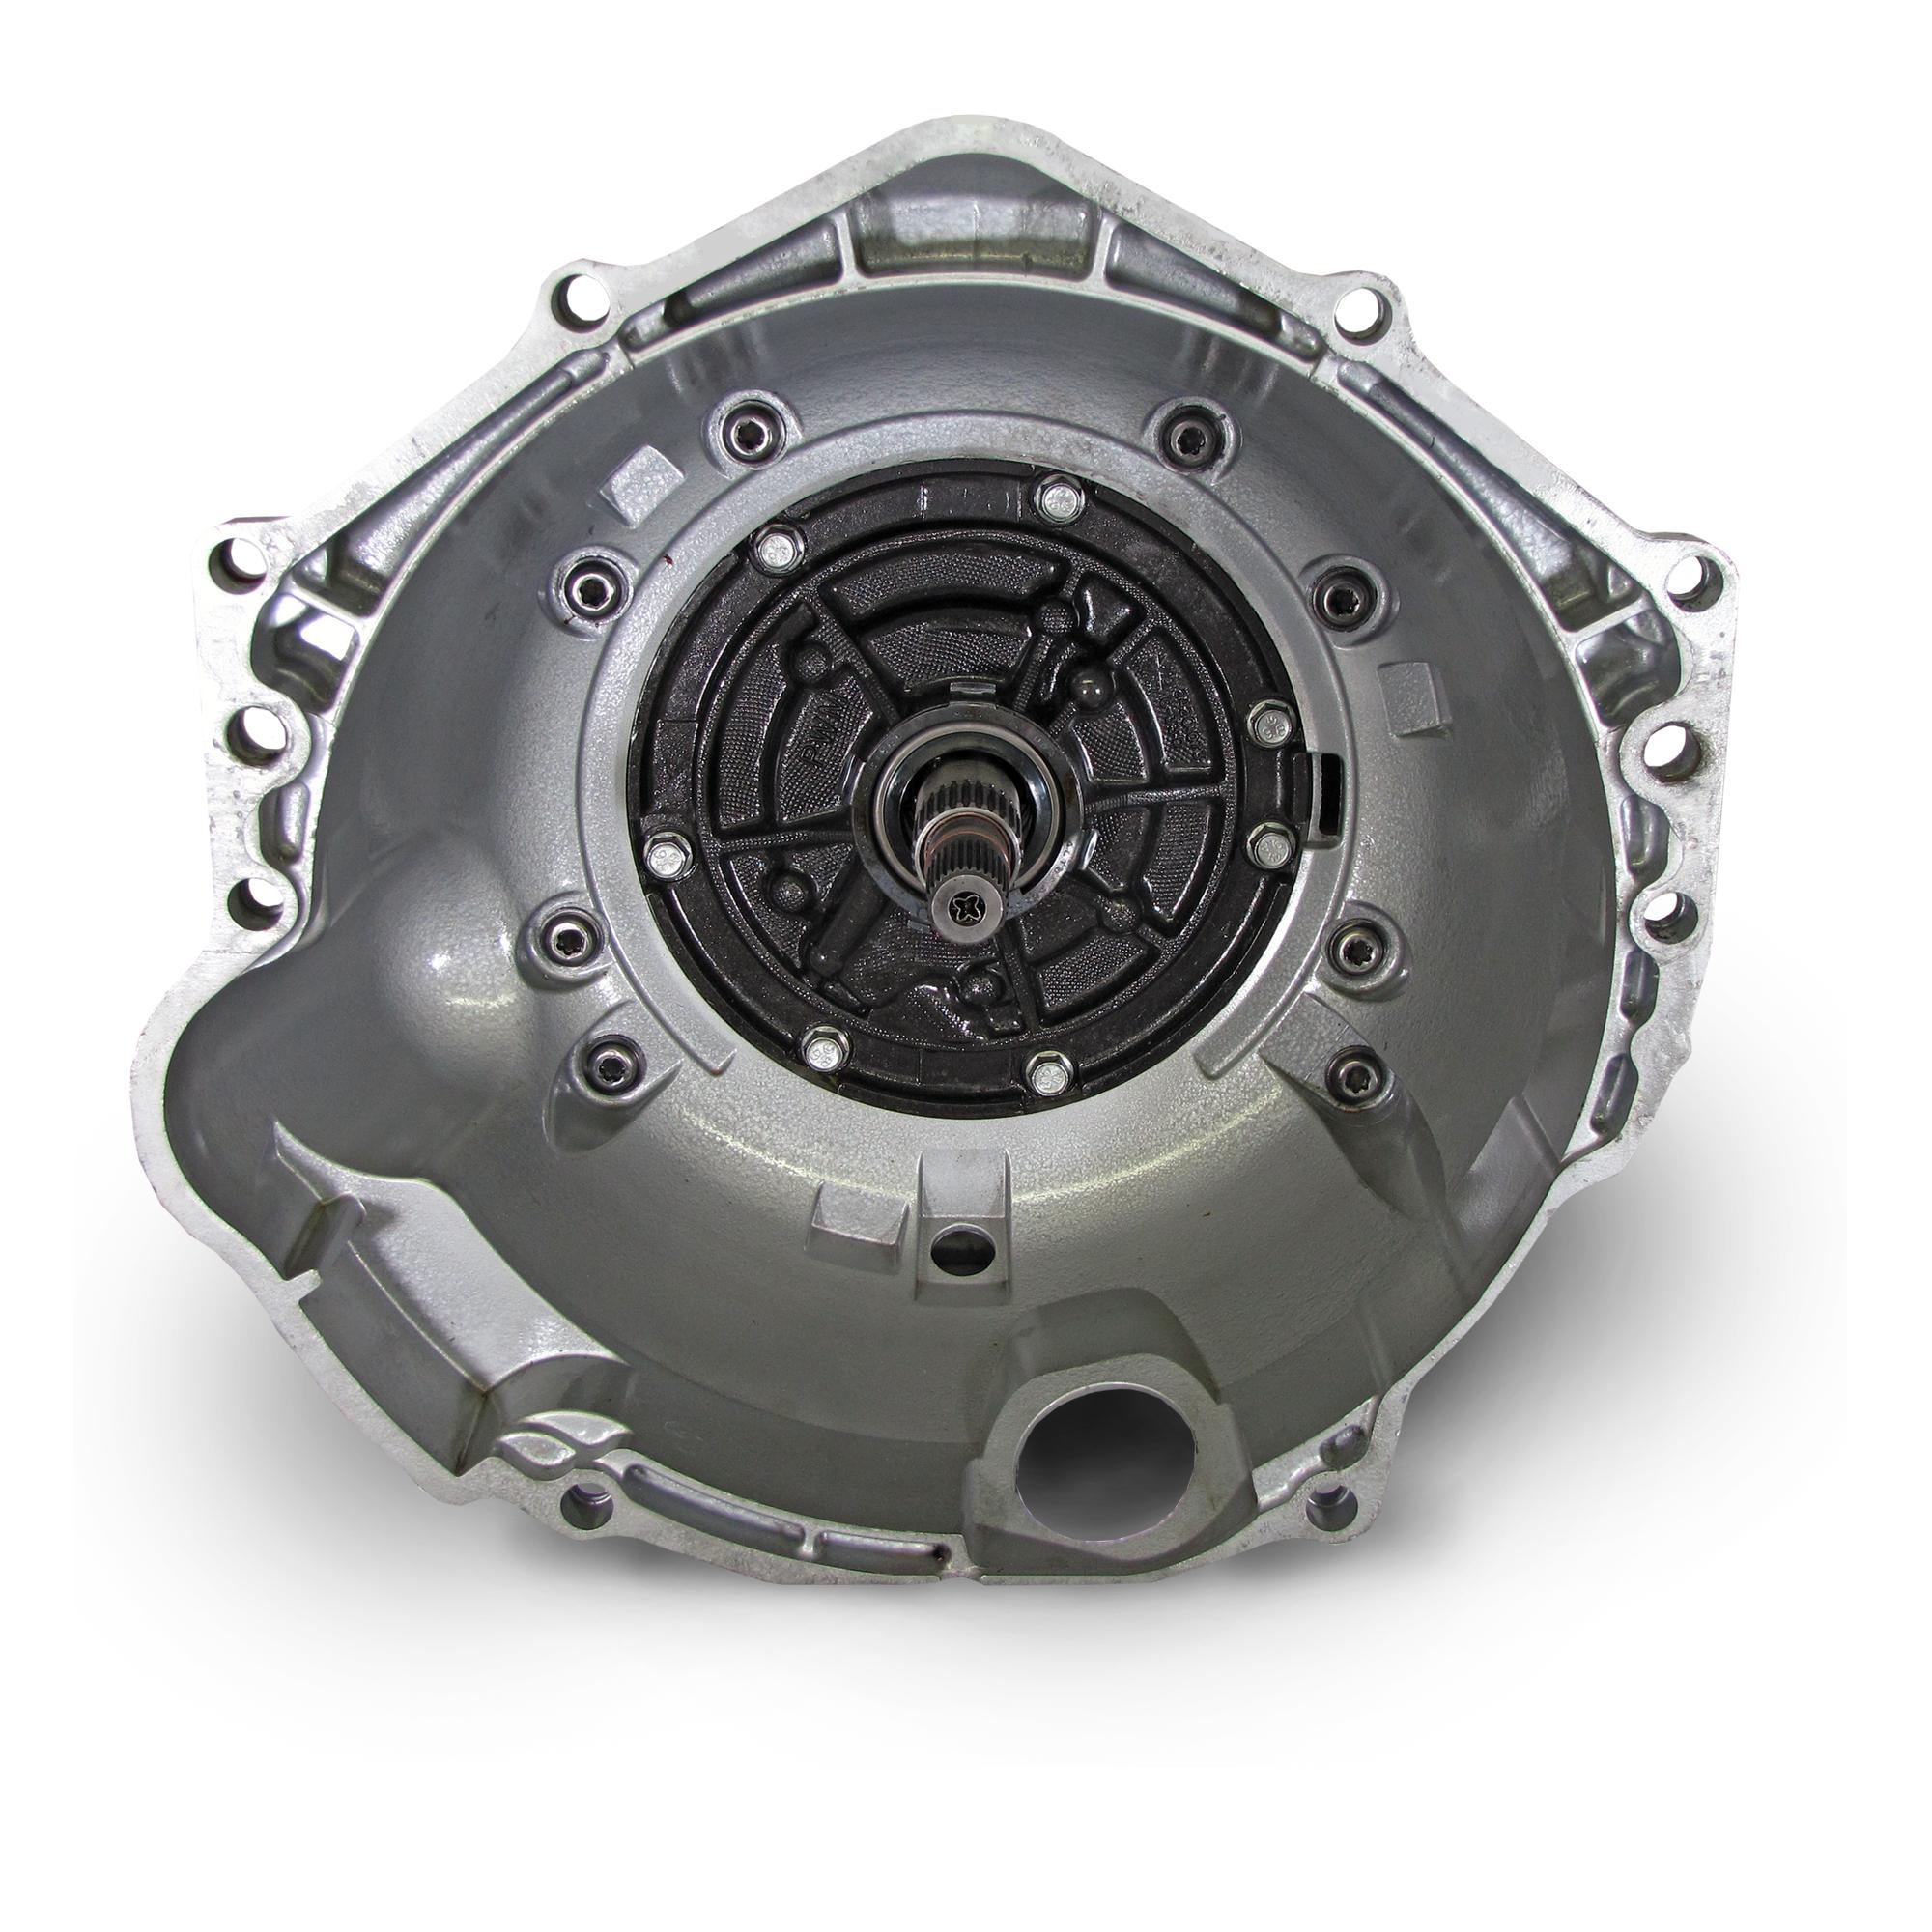 4L60E Transmission Remanufactured 4x4 Heavy Duty 2pc Case 4WD